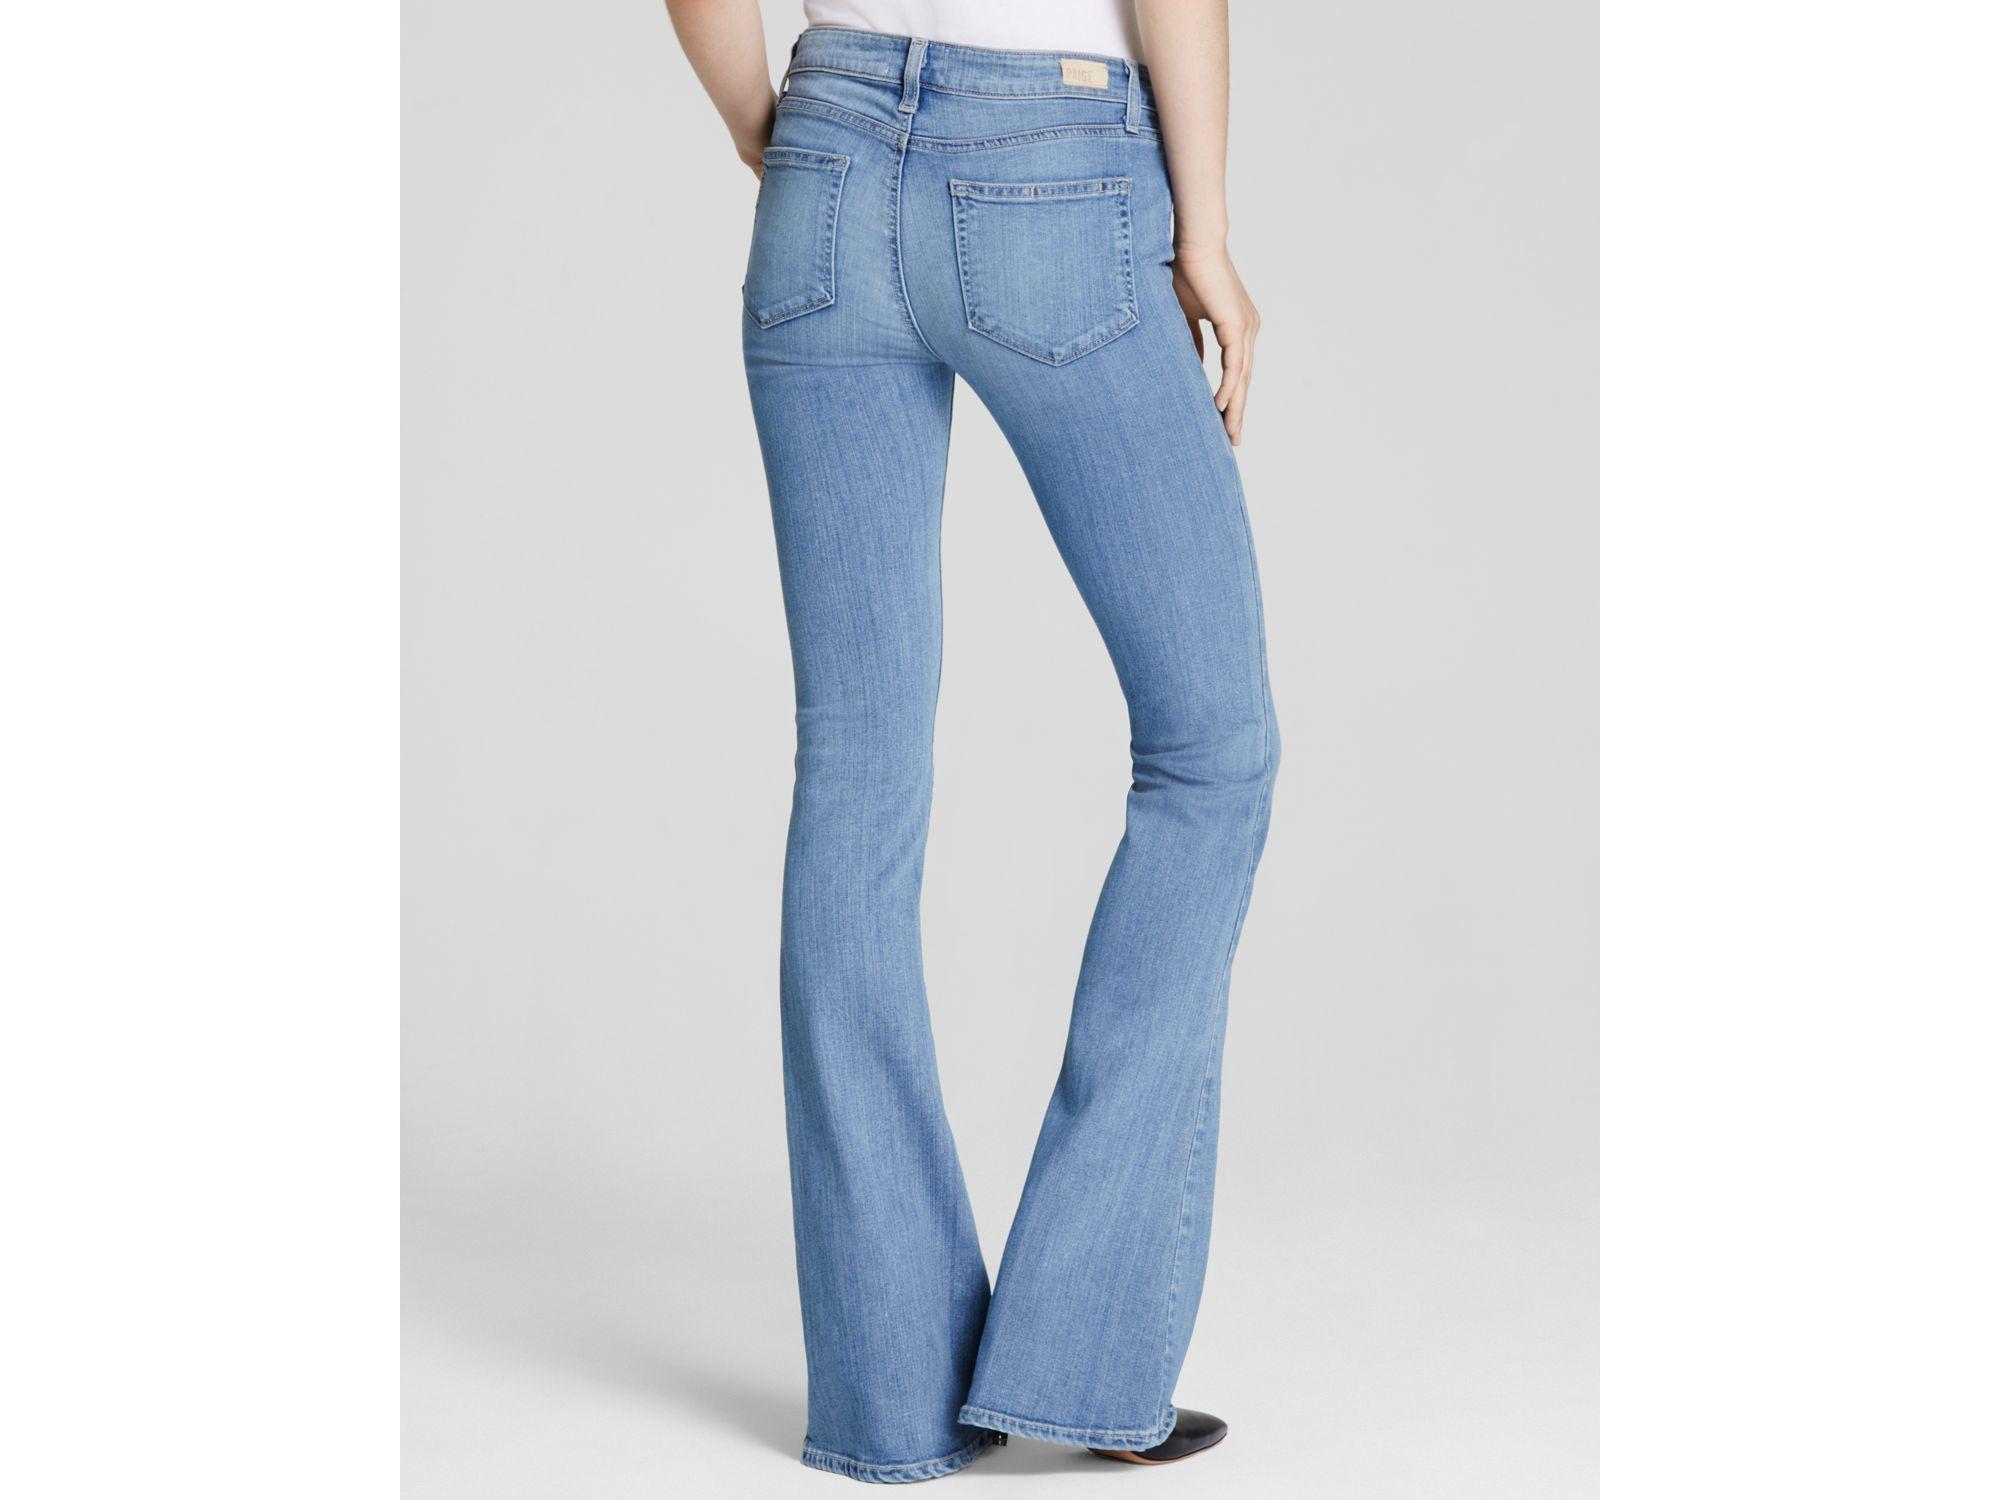 Paige Medium Wash Lou Lou Flare Jeans In Joelle in Blue   Lyst